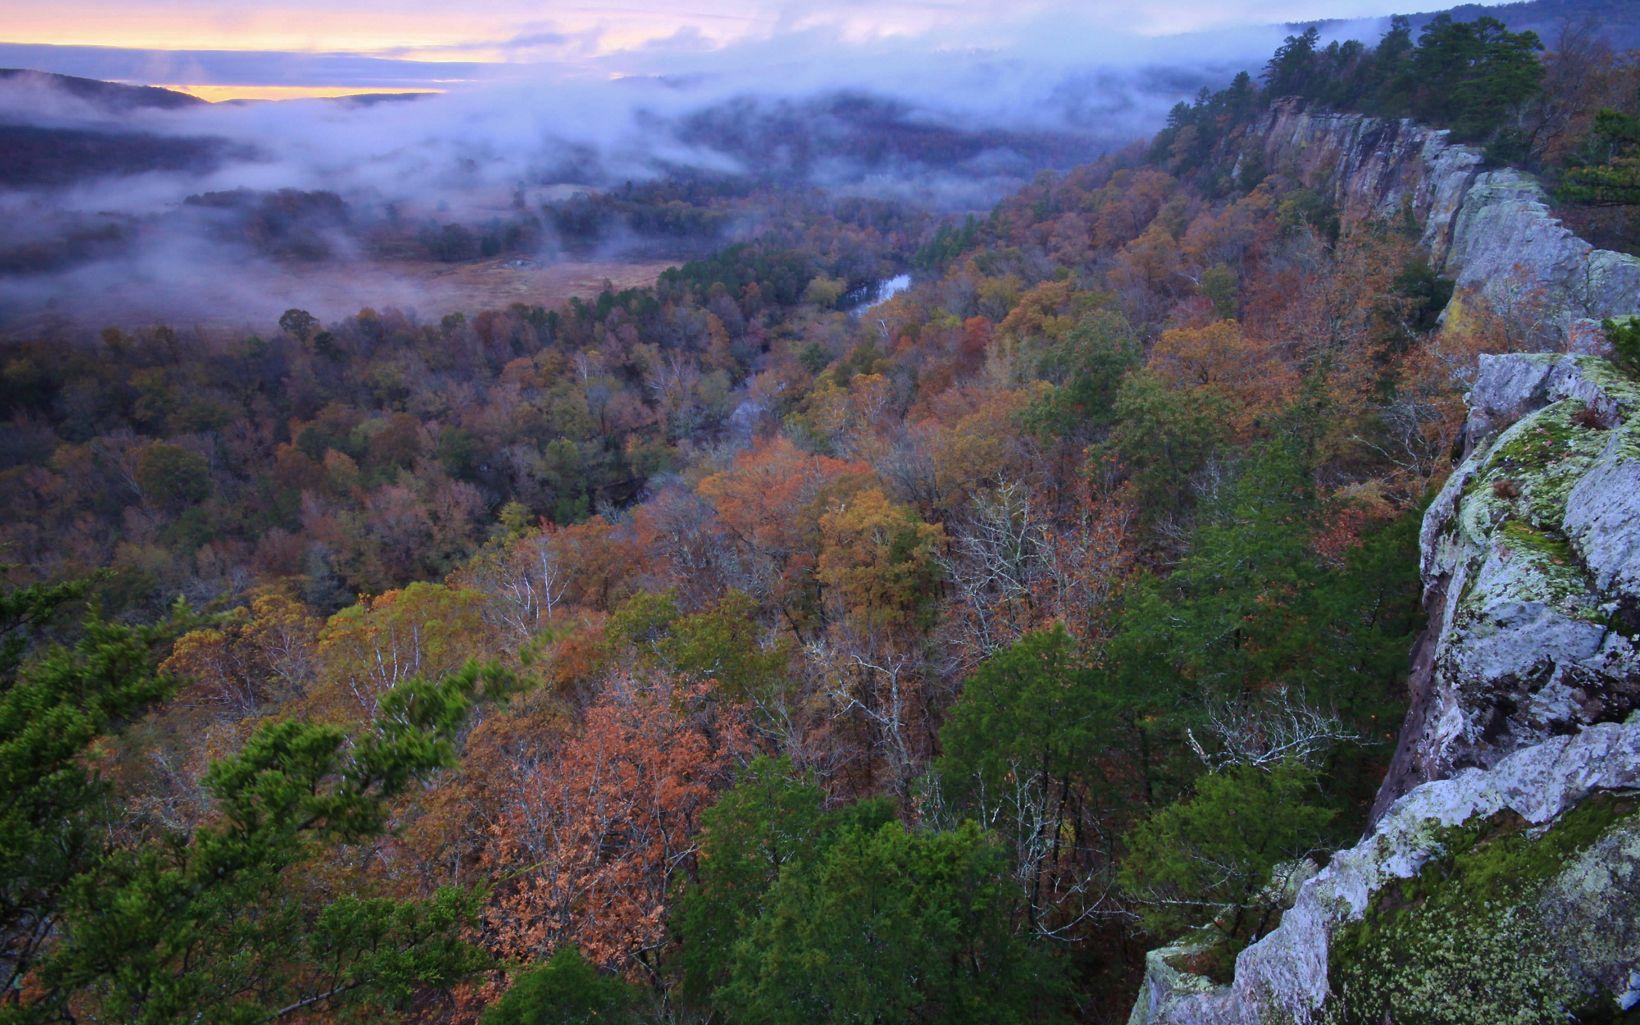 Razorback Ridge at Bluffton Preserve